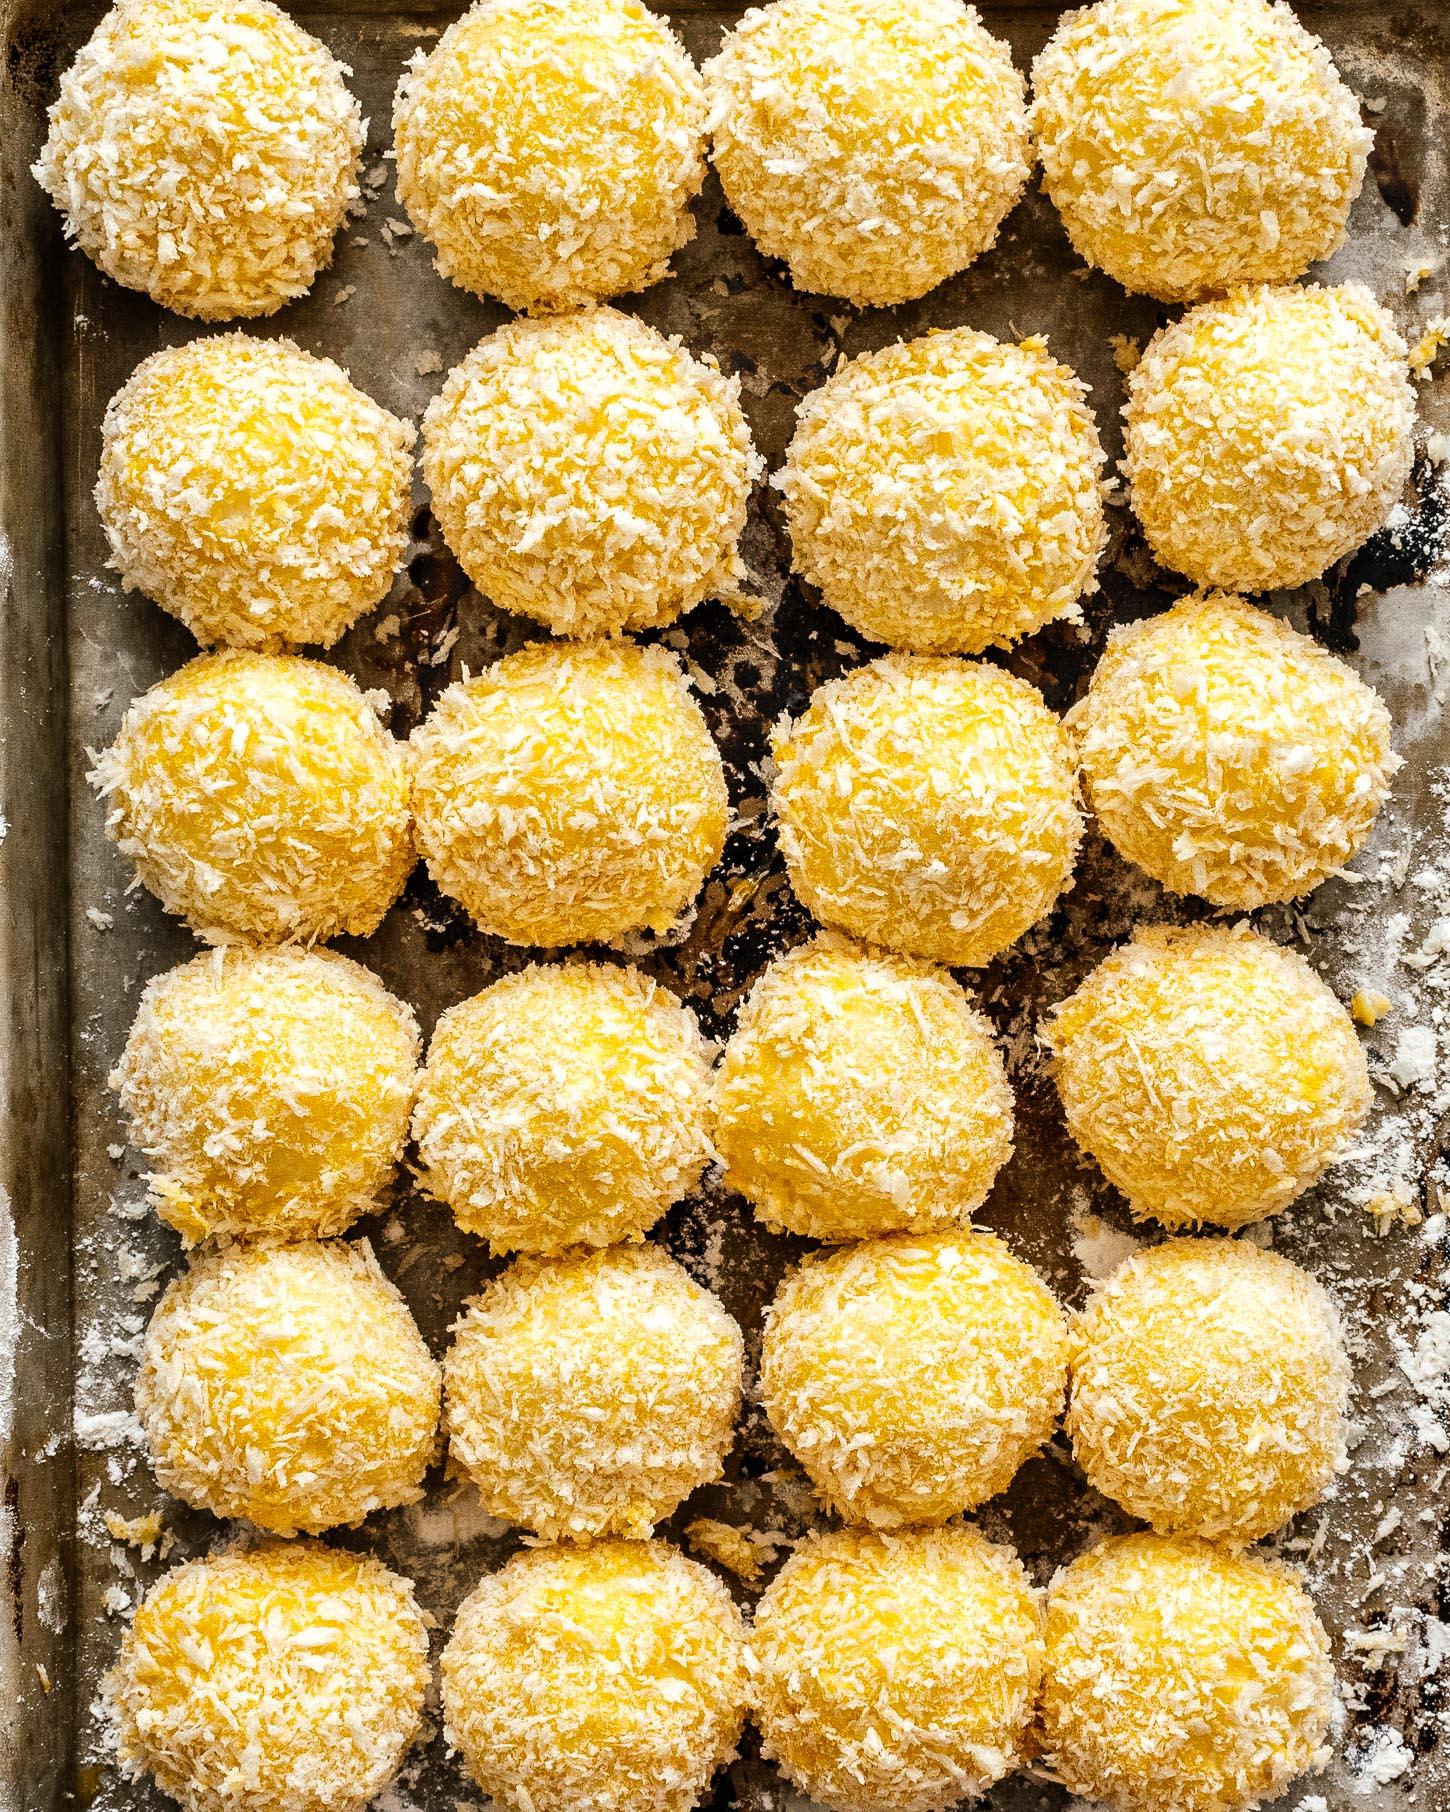 How to make Cheesy Potato Balls | www.iamafoodblog.com